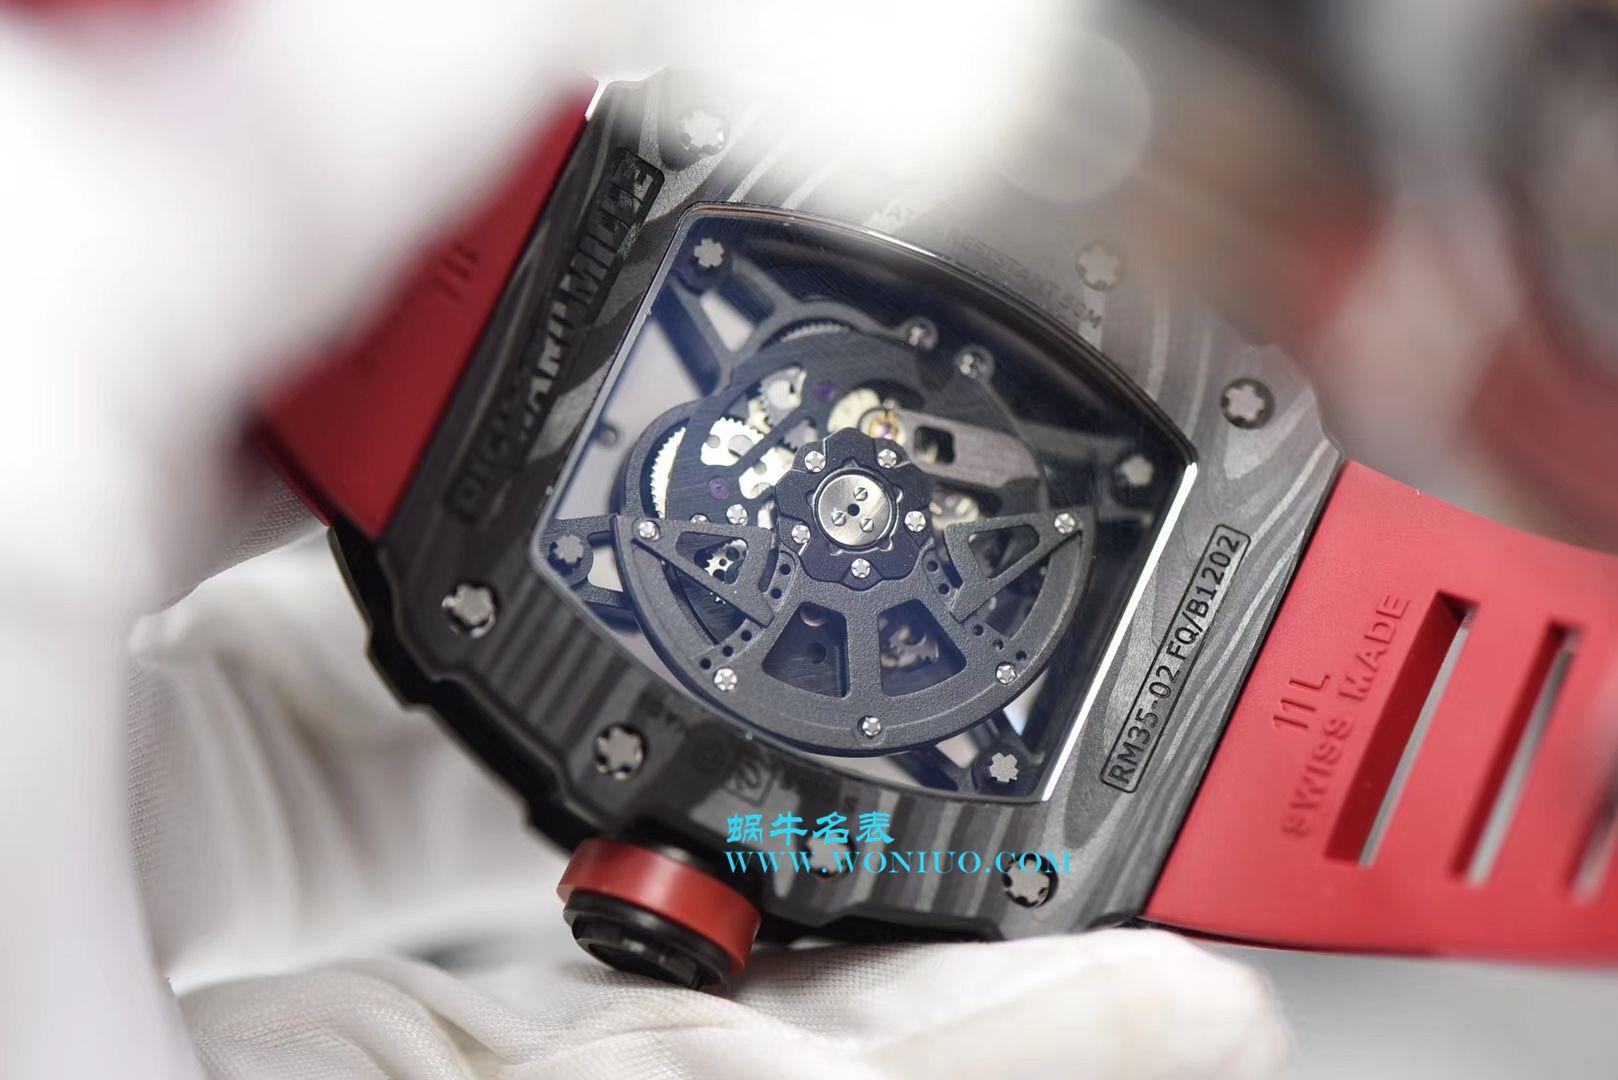 【KV厂顶级复刻手表】RICHARD MILLE里查德米尔男士系列RM 35-02 RAFAEL NADAL腕表 / RM 35-2AAA